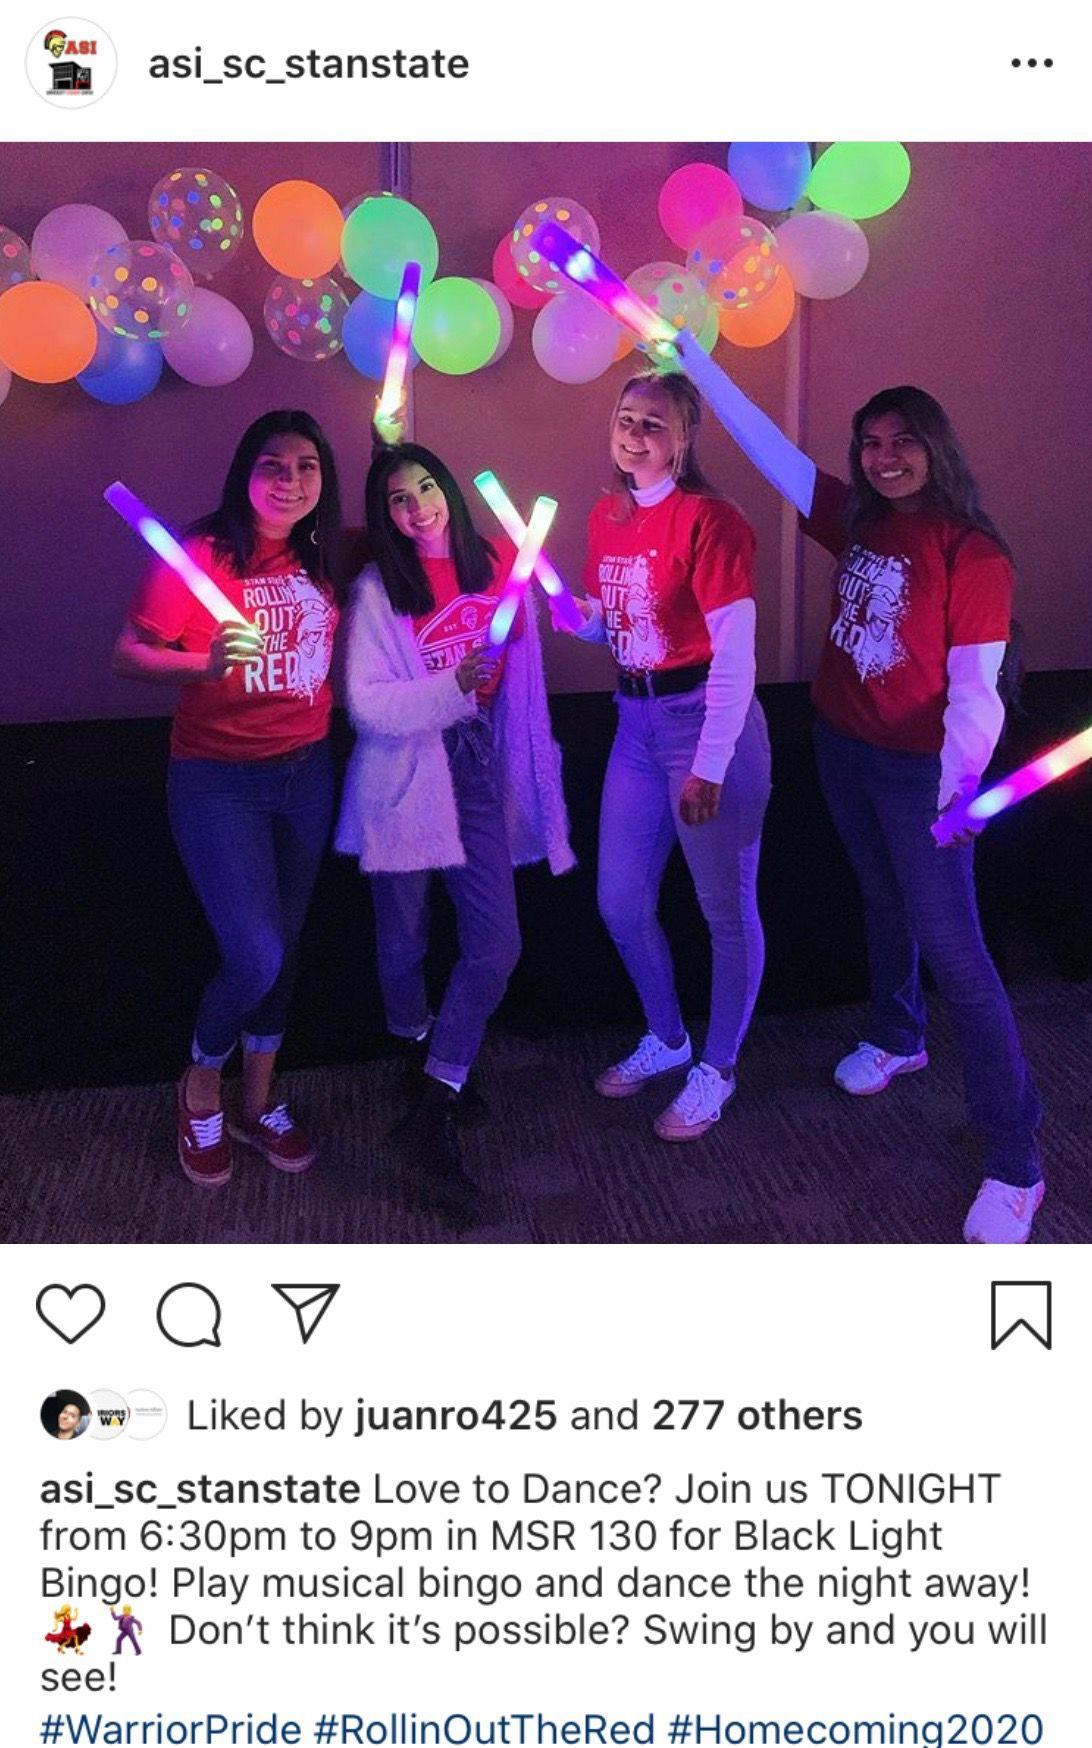 Members of ASI at Black Light Bingo. Courtesy of ASI instagram. @asi_sc_stanstate